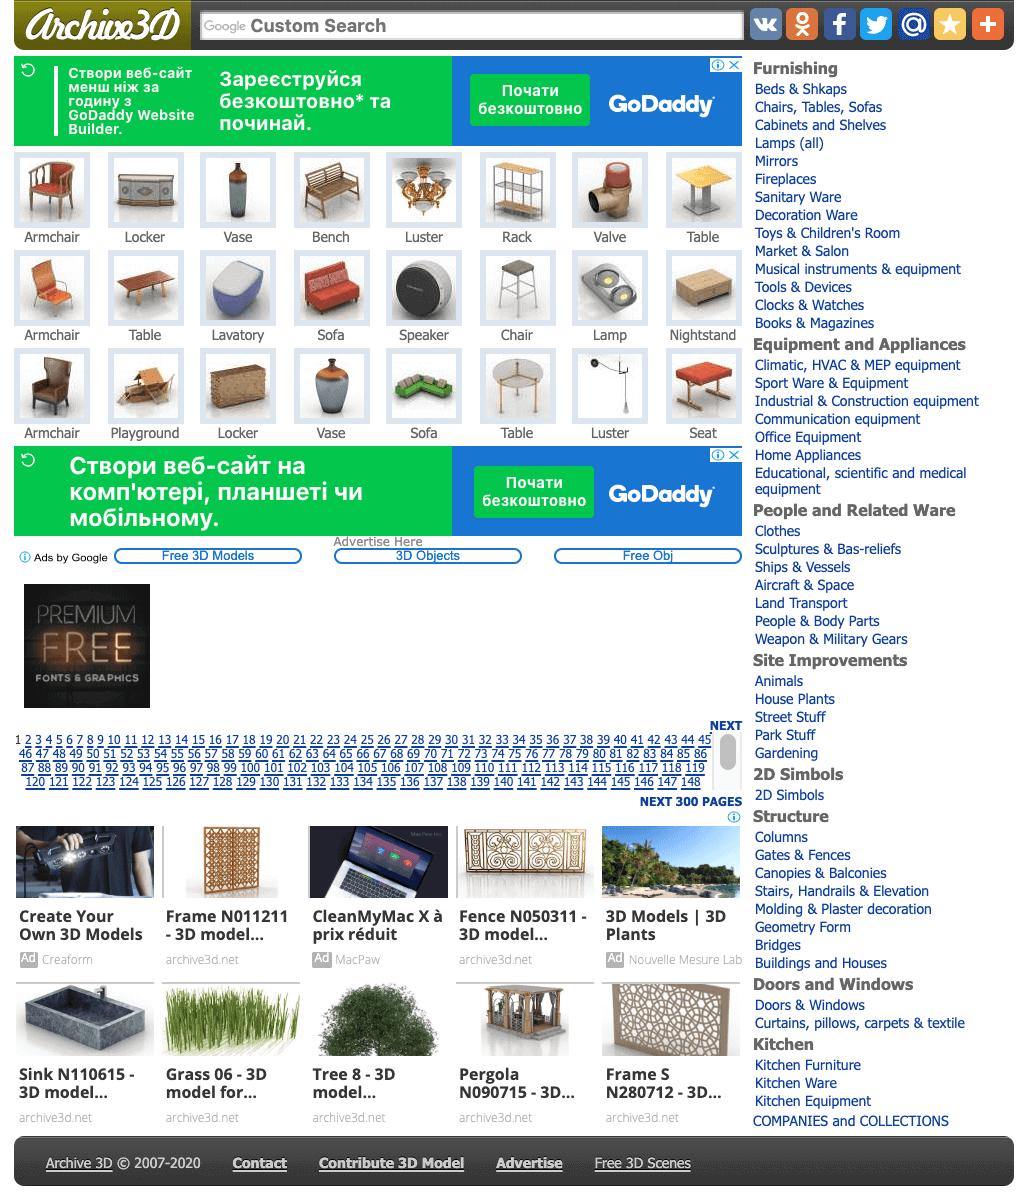 Site 3D Cad Blocks